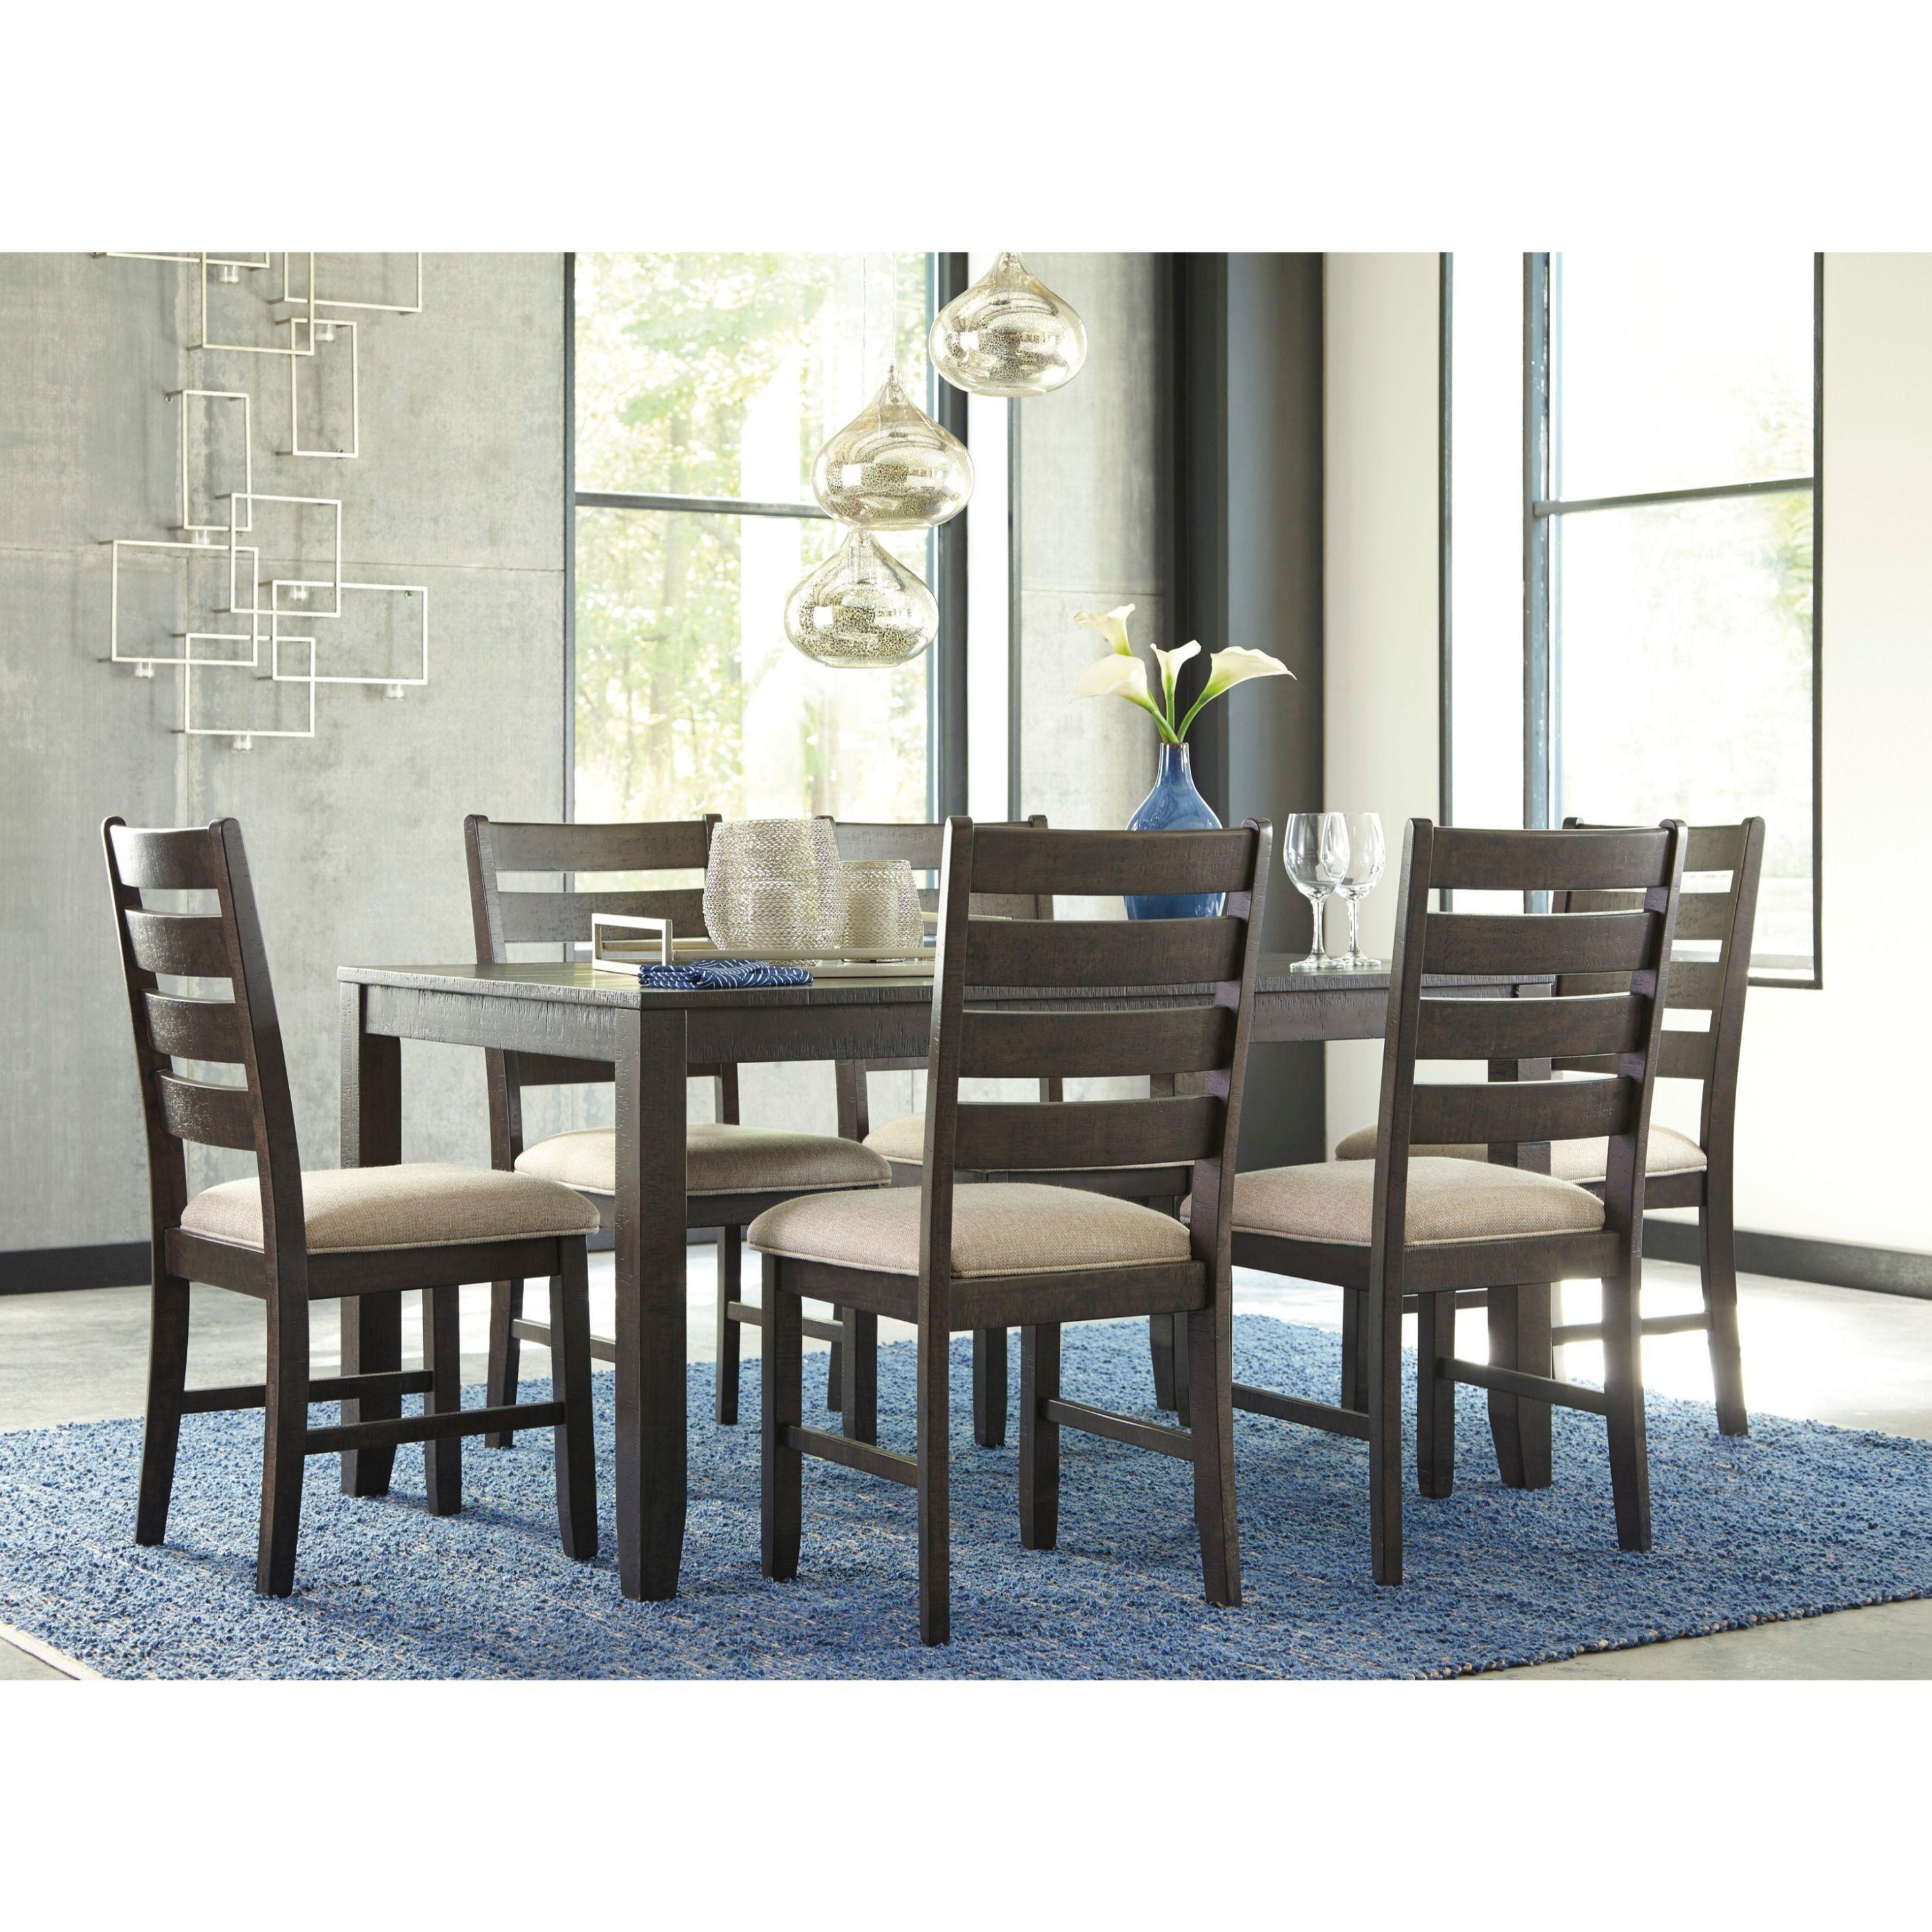 20 Beautiful Kanes Furniture Dining Room Sets 2019 Brown Dining Room Table Dining Room Table Set Brown Dining Room